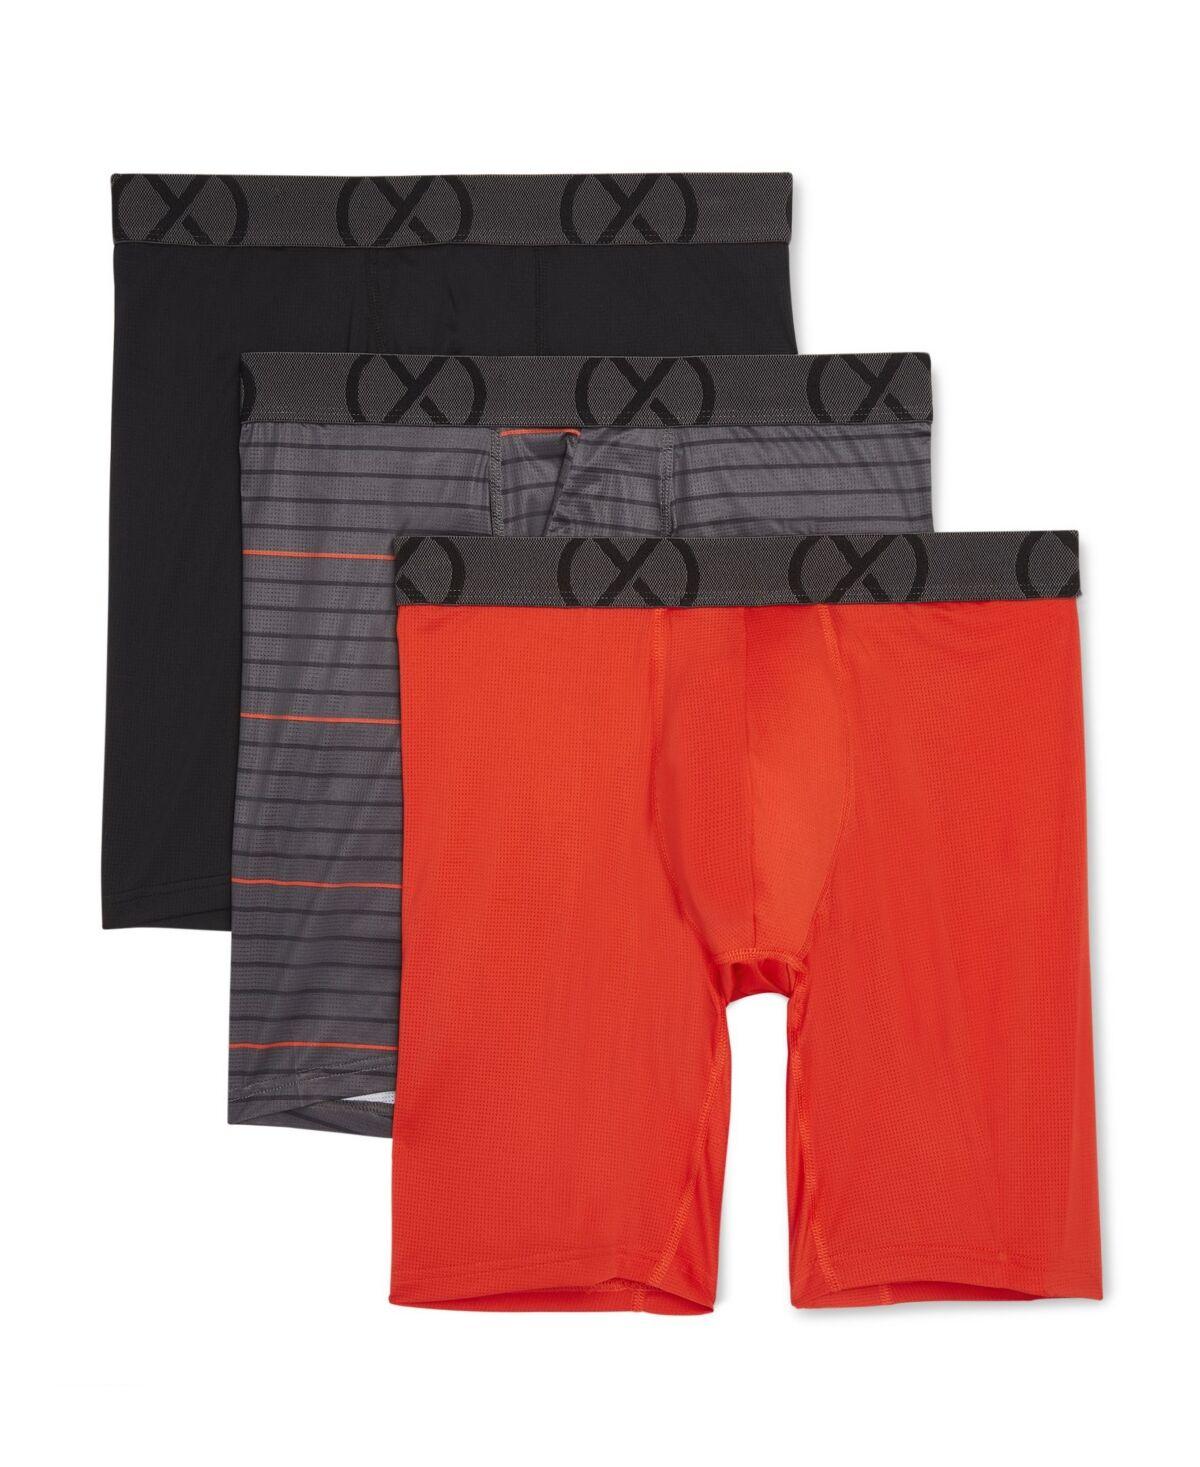 2xist Men's Sport Mesh Boxer Brief Set, Pack of 3